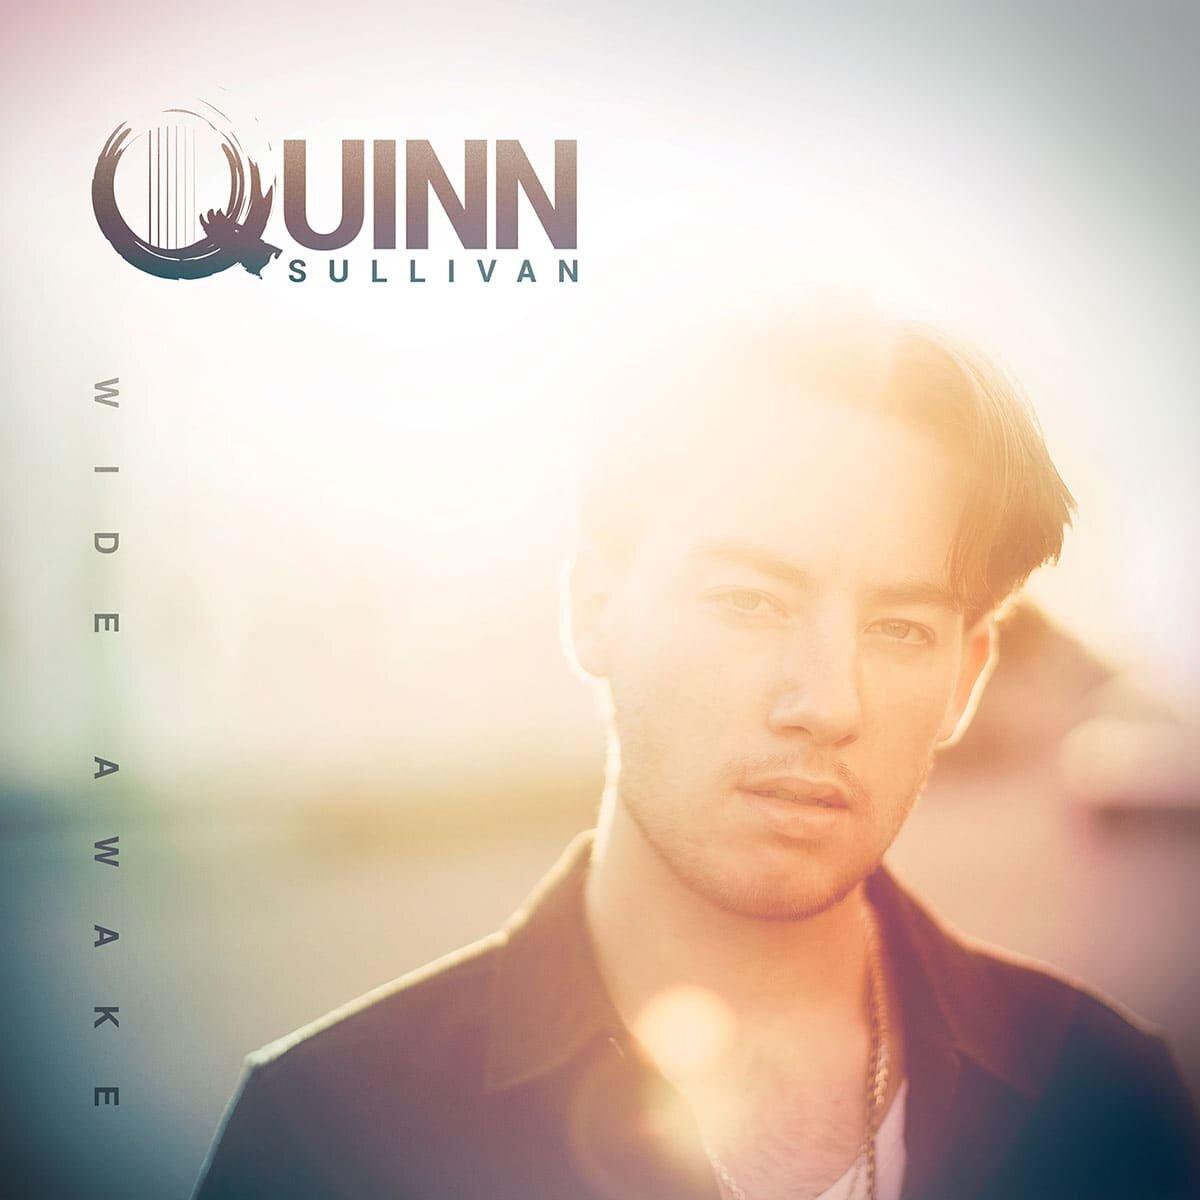 Quinn-Sullivan-wide-awake